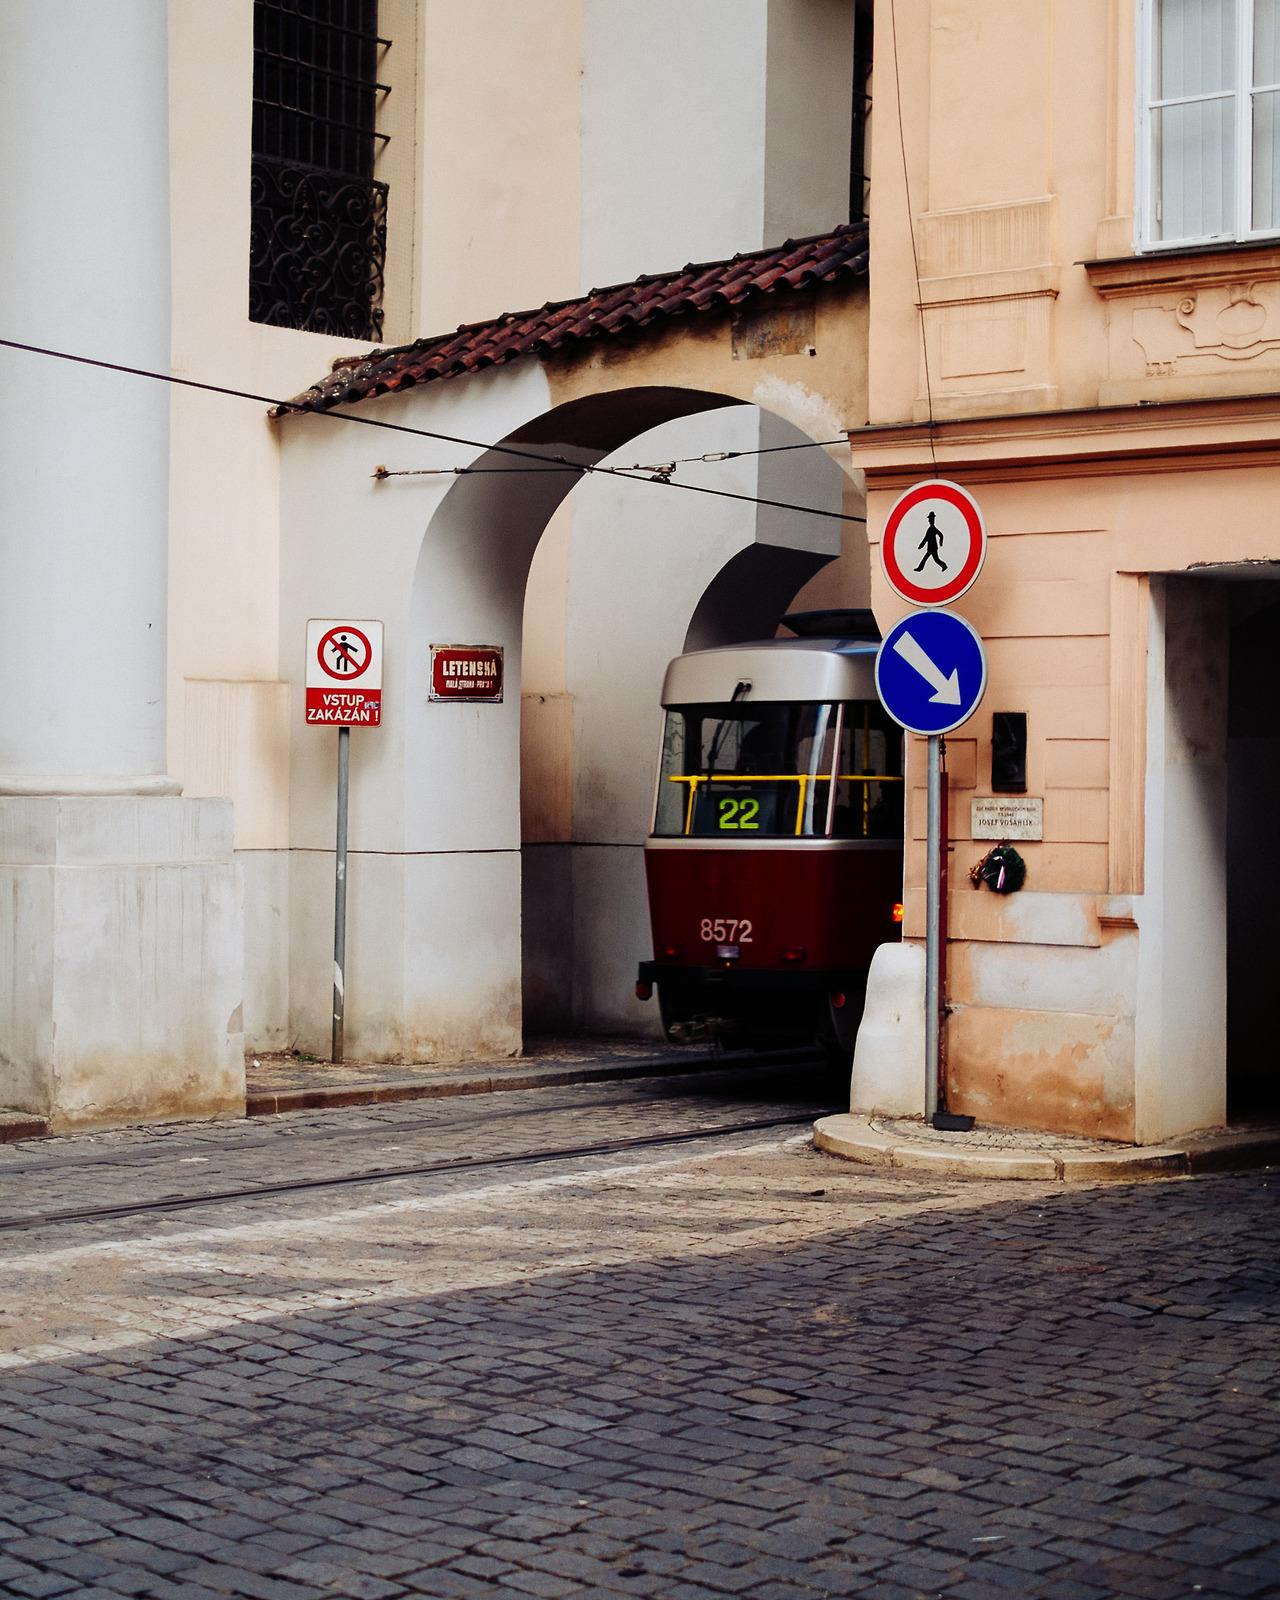 #22 Tram